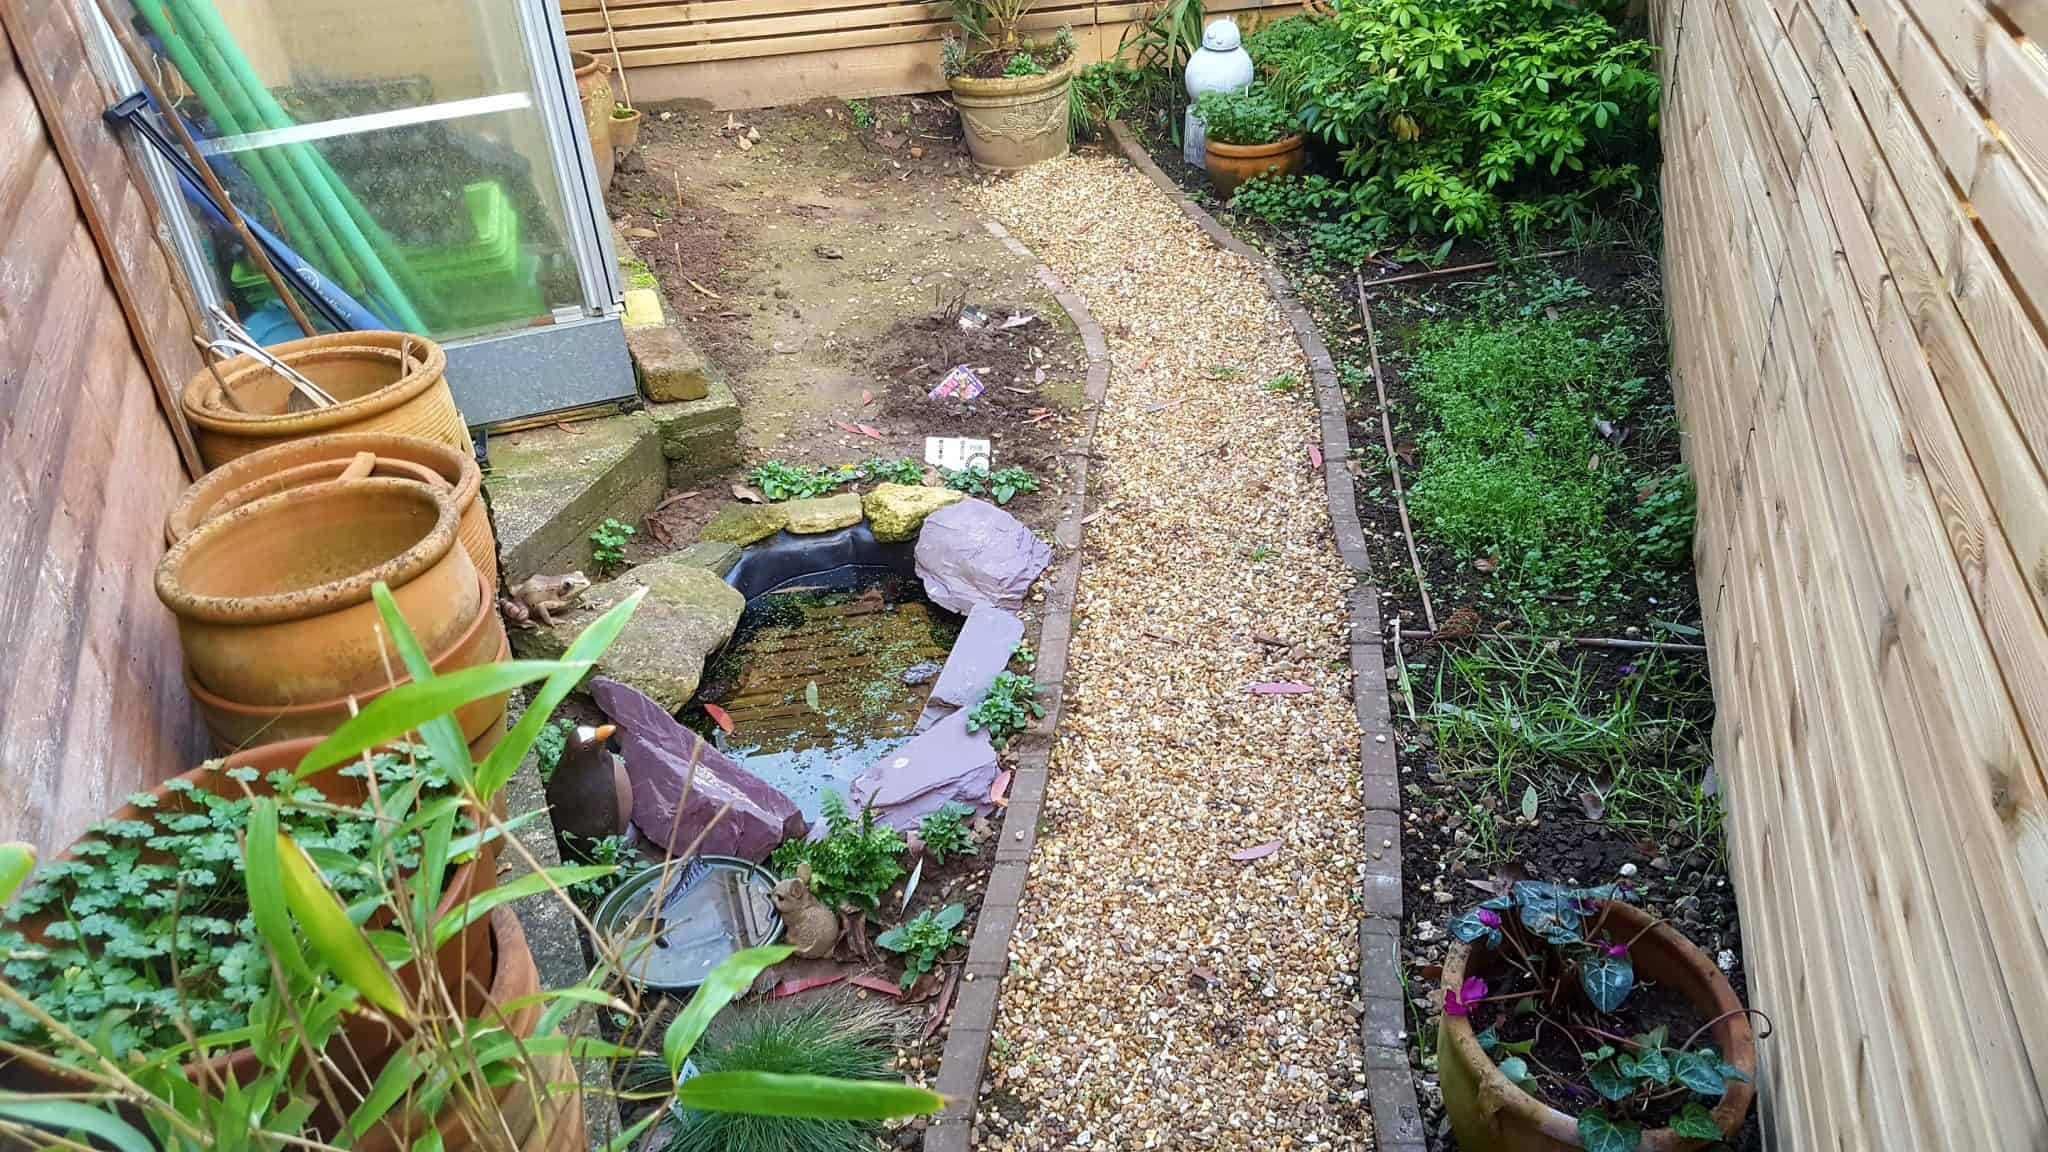 January-in-my-garden